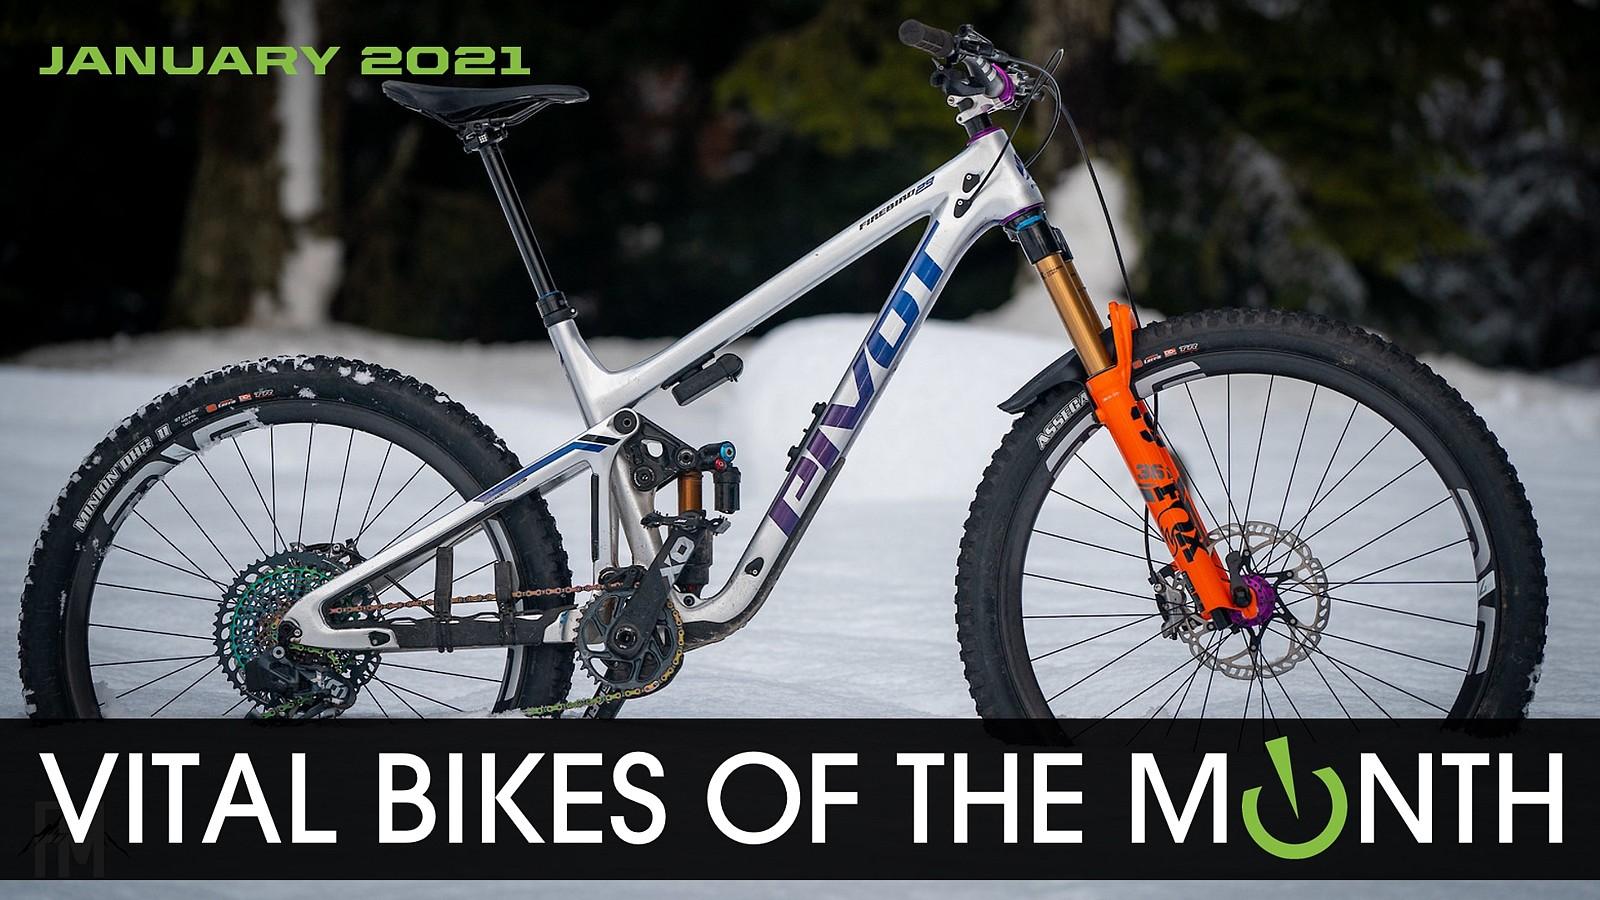 Vital Bikes of the Month, January 2021 - Vital Bike of the Day January 2021 - Mountain Biking Pictures - Vital MTB